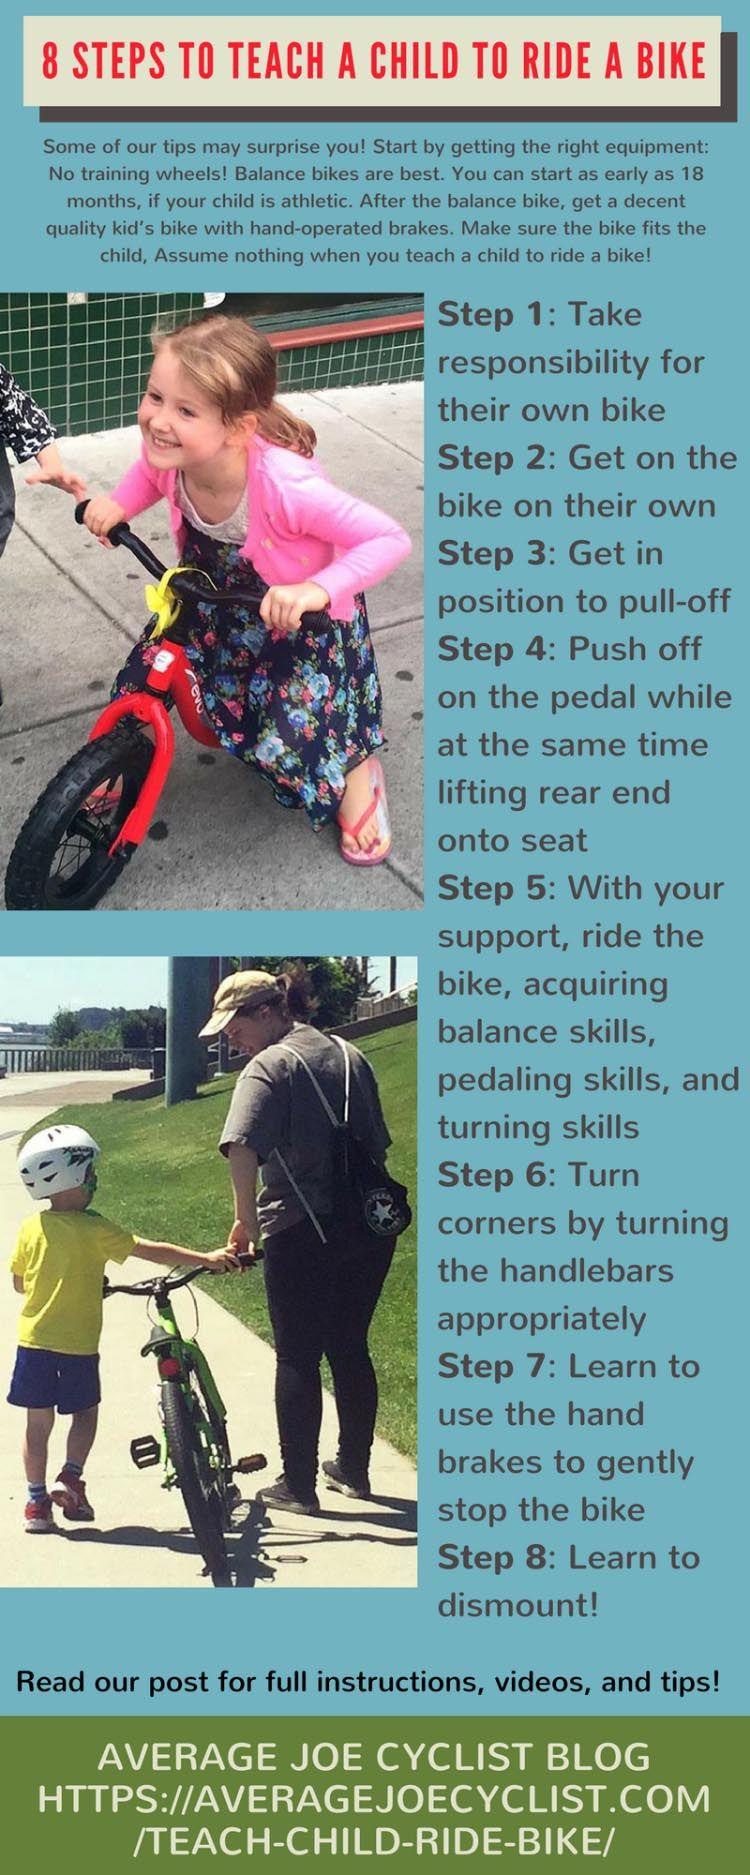 9 Simple Steps To Teach A Child To Ride A Bike Ciclismo Bicicletas